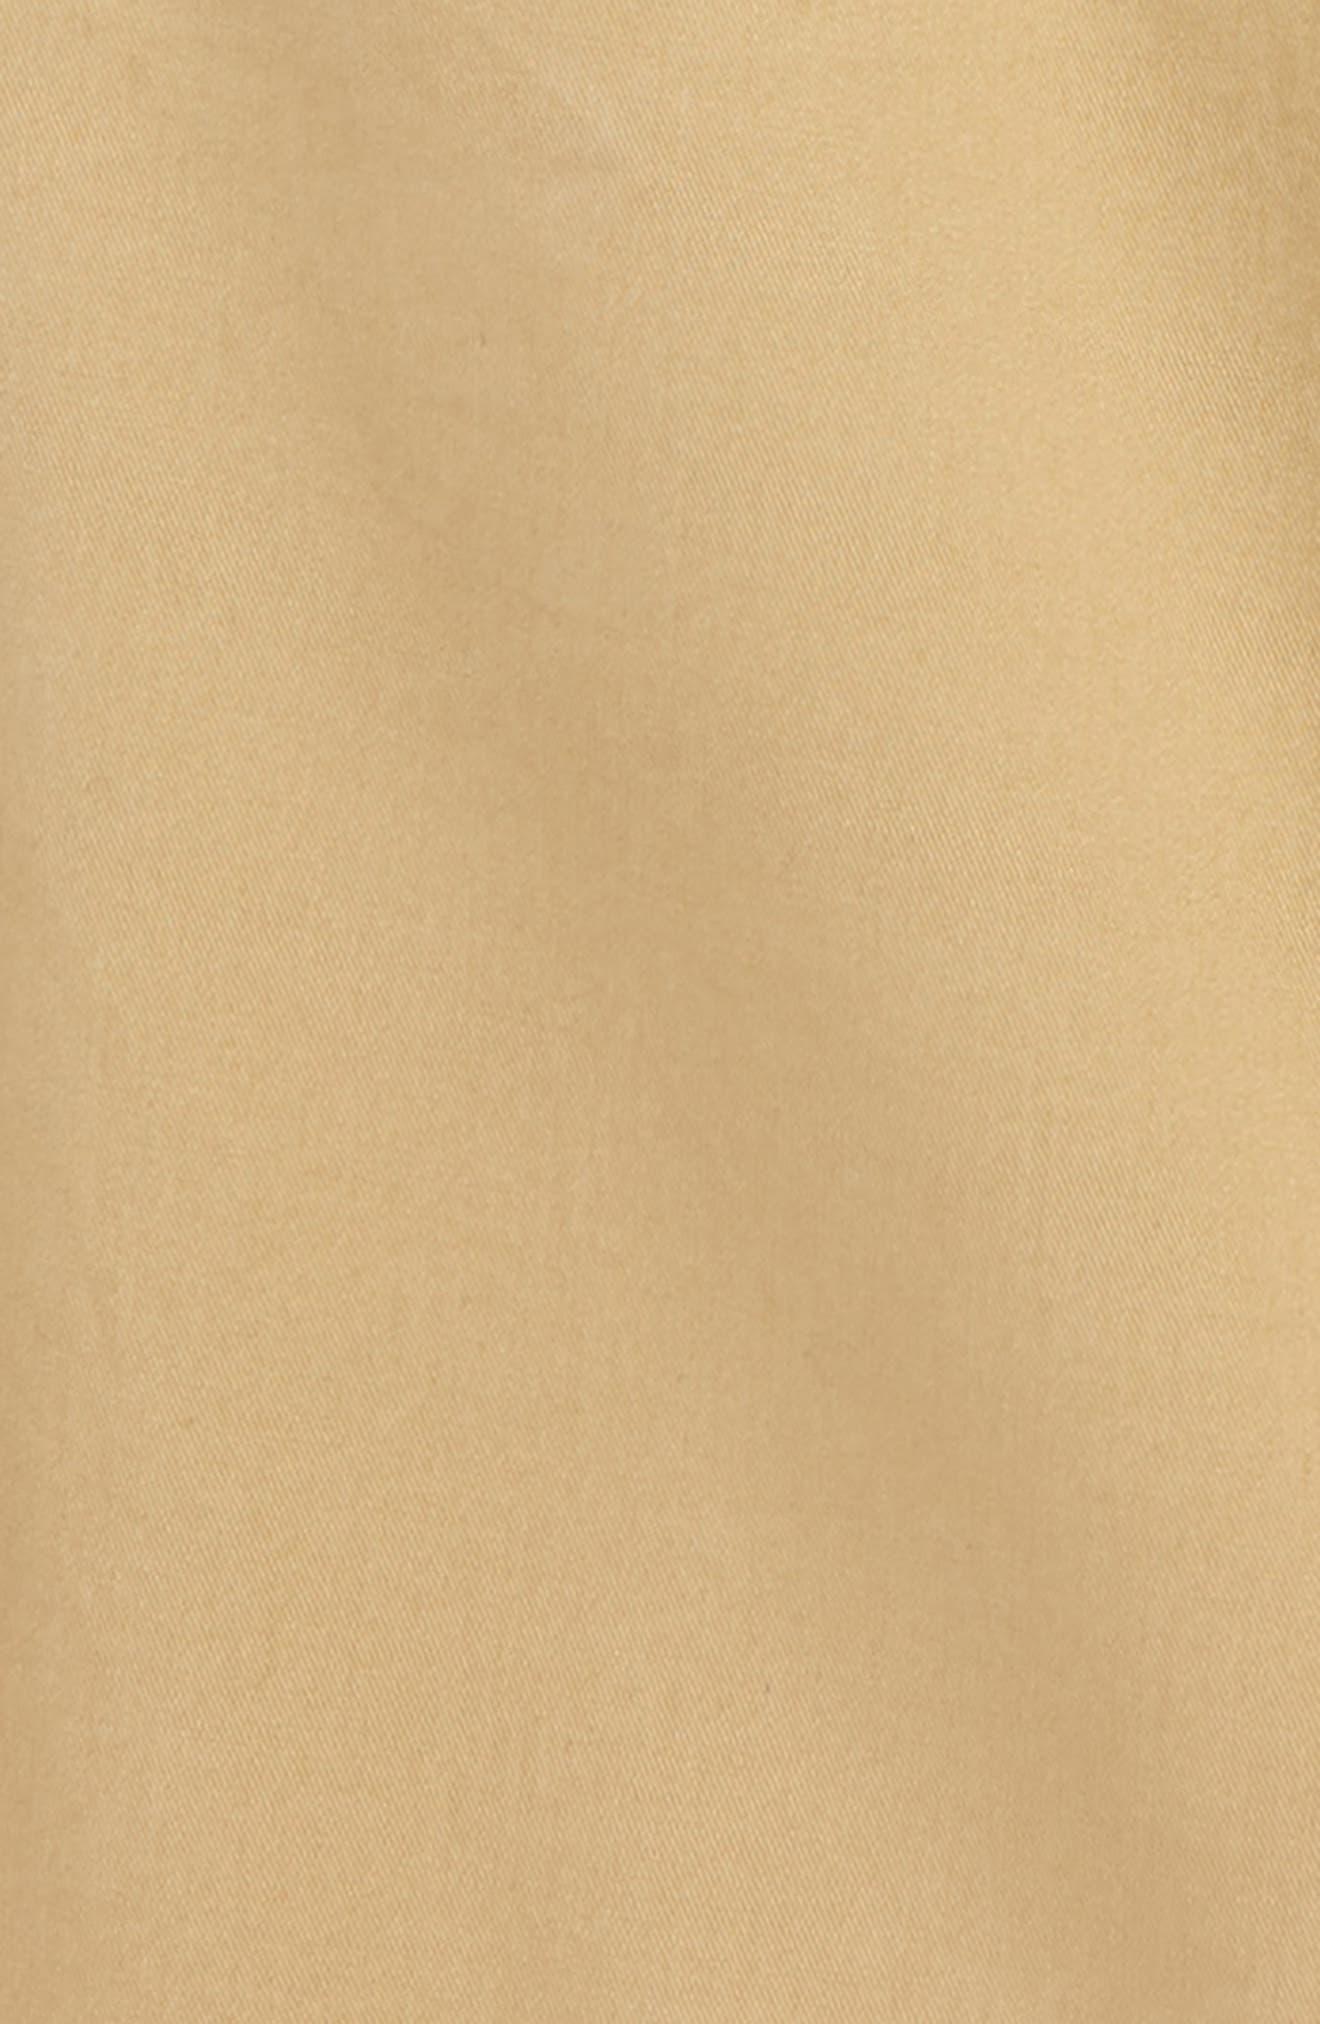 TUCKER + TATE, Chino Shorts, Alternate thumbnail 2, color, 230